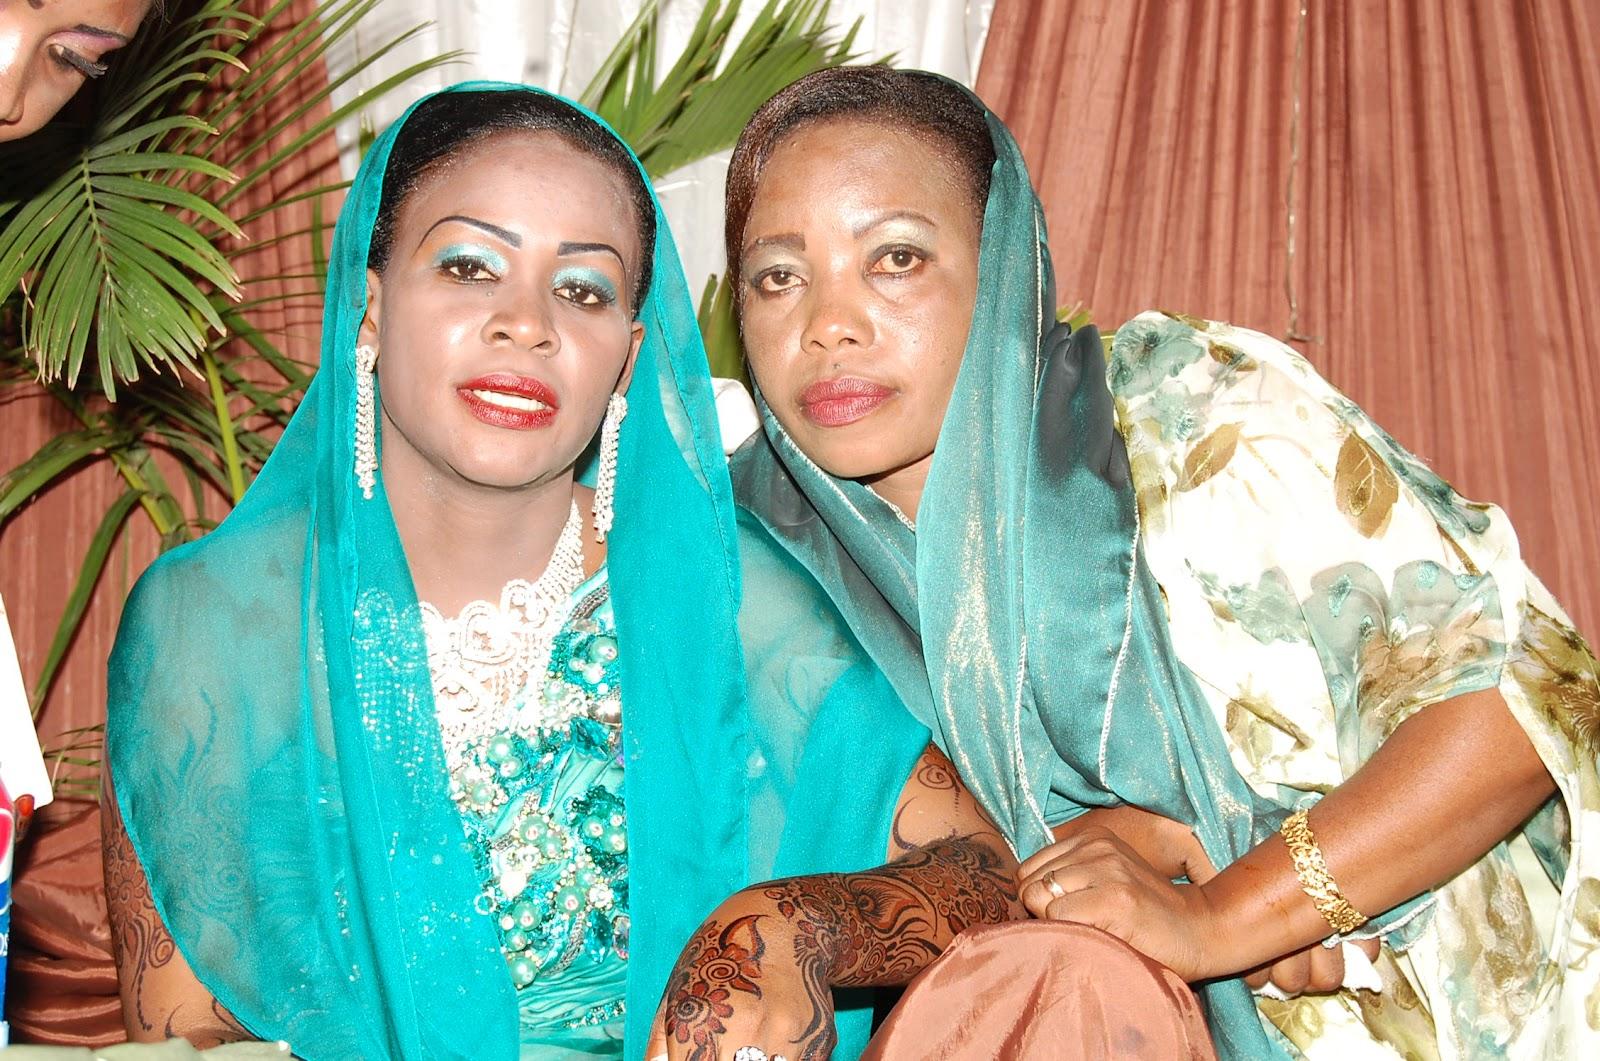 Tbc 1 Harusi Yangu http://www.mashughuliblog.com/2012/03/aqdi-ya